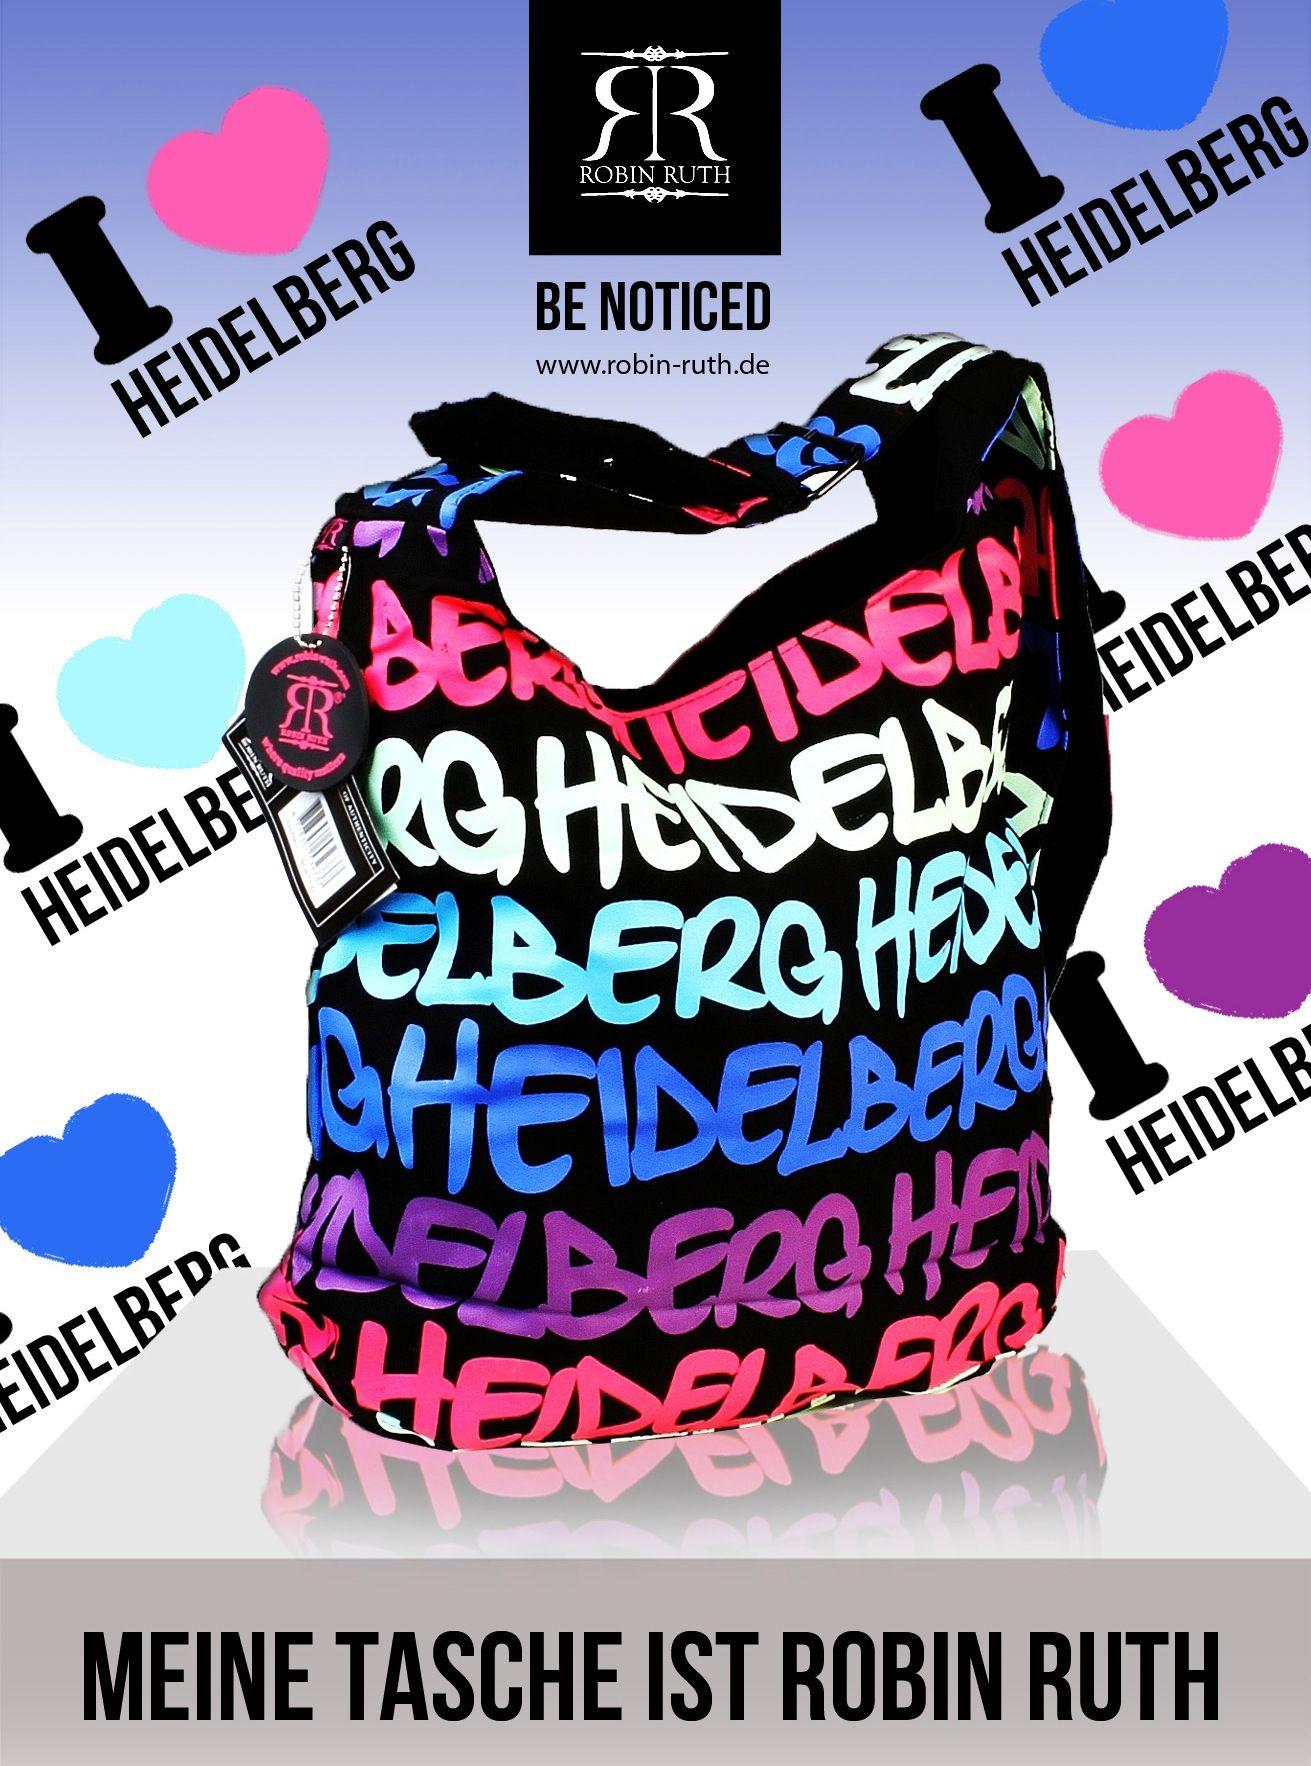 #RobinRuth #citybag #heidelberg #souvenirs